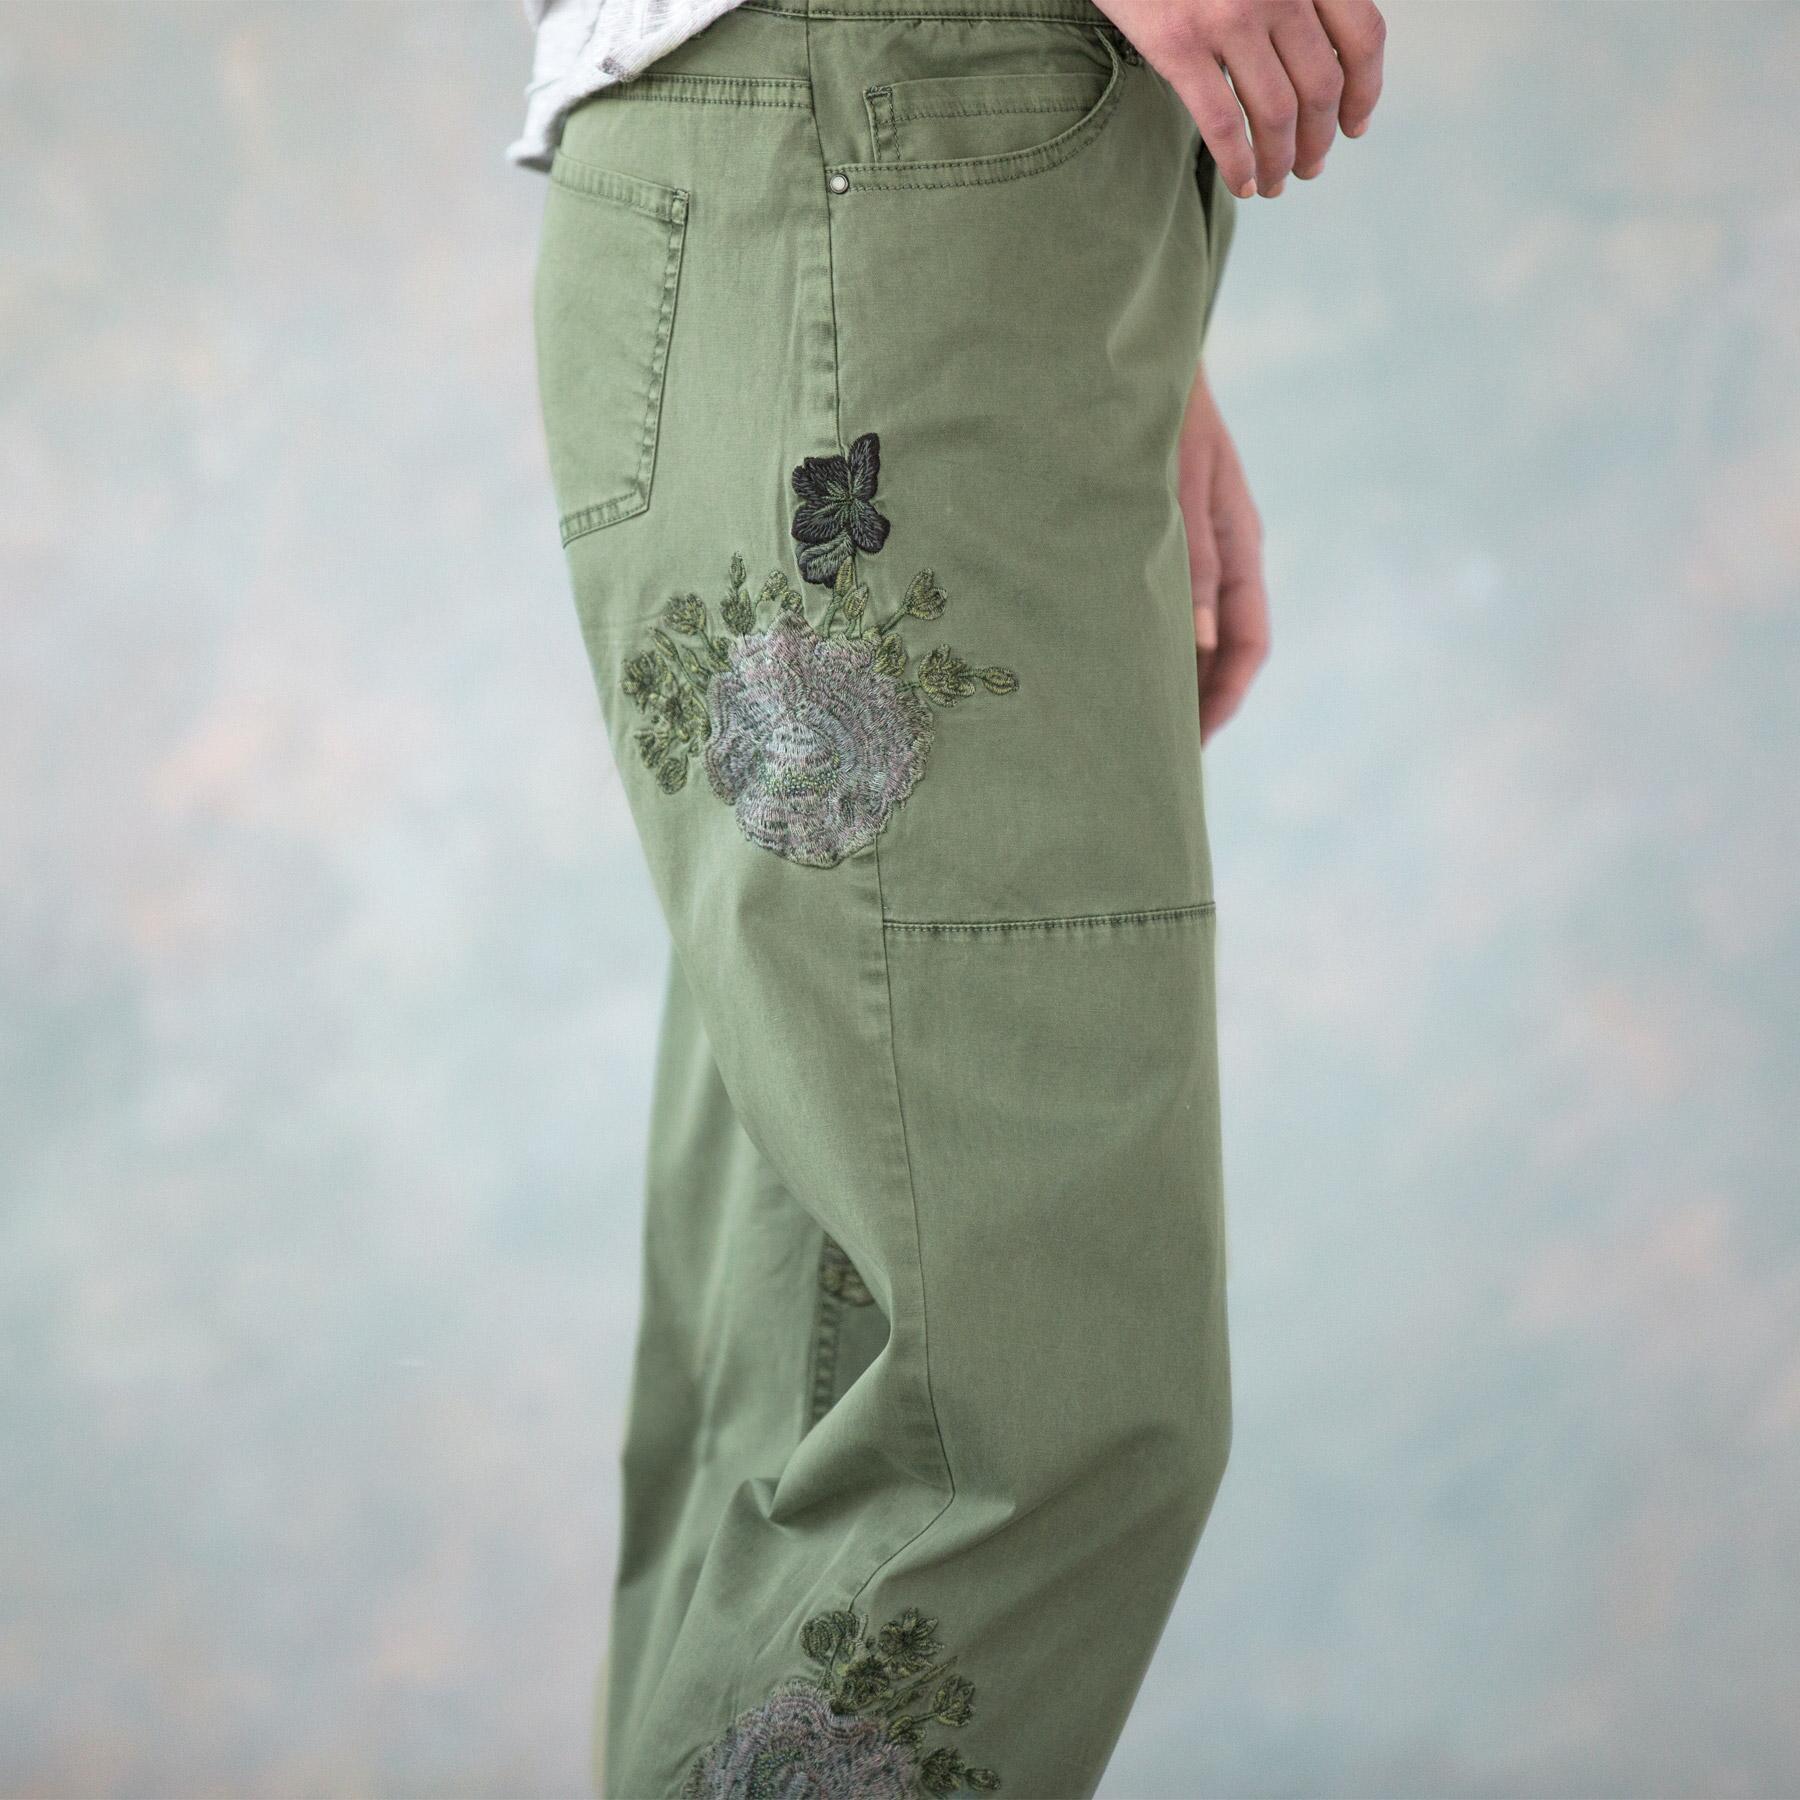 NATURAL APPEAL CARGO PANTS - PETITES: View 3